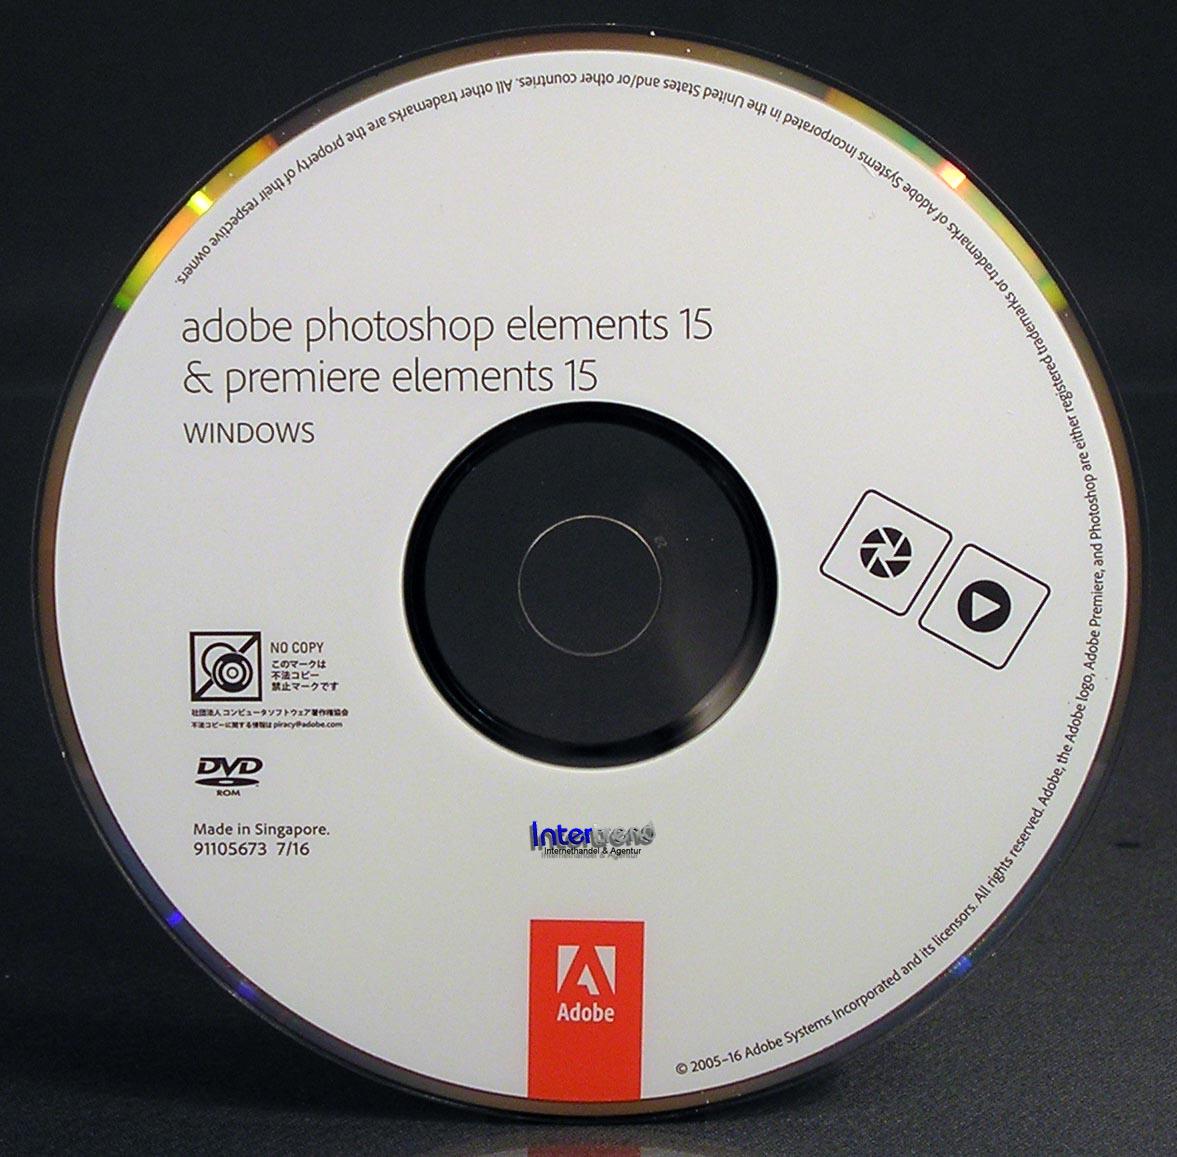 Adobe Photoshop Elements 15 Mac Download